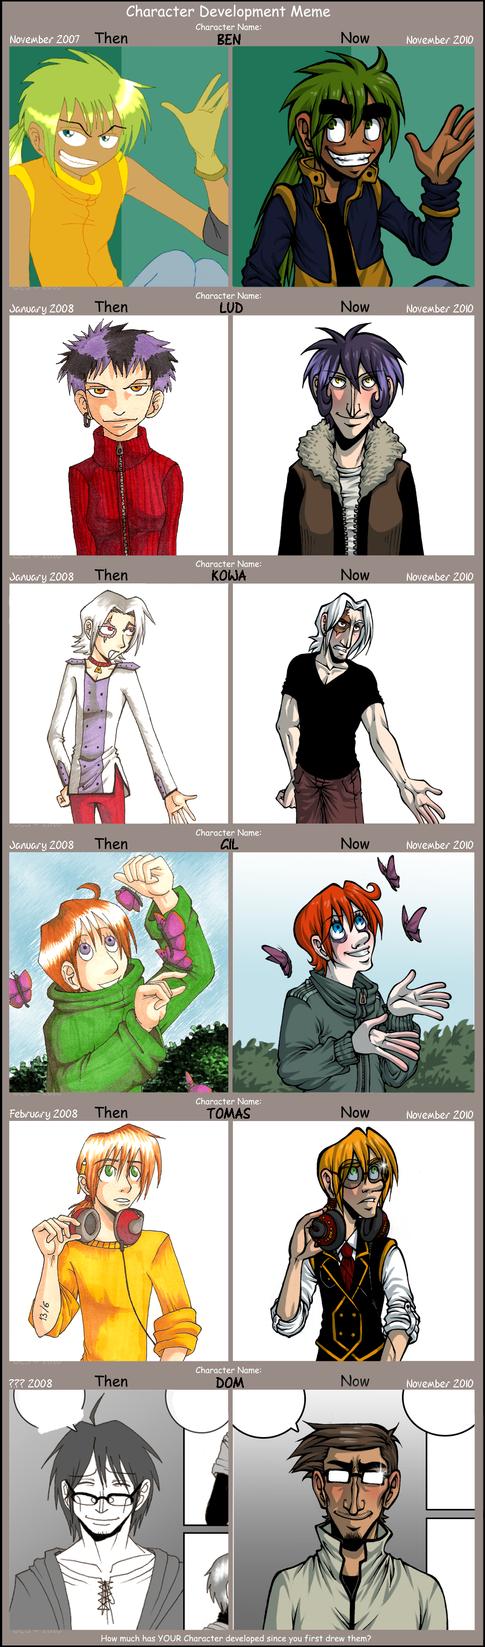 Character Development Meme by GreenLiquidBrain